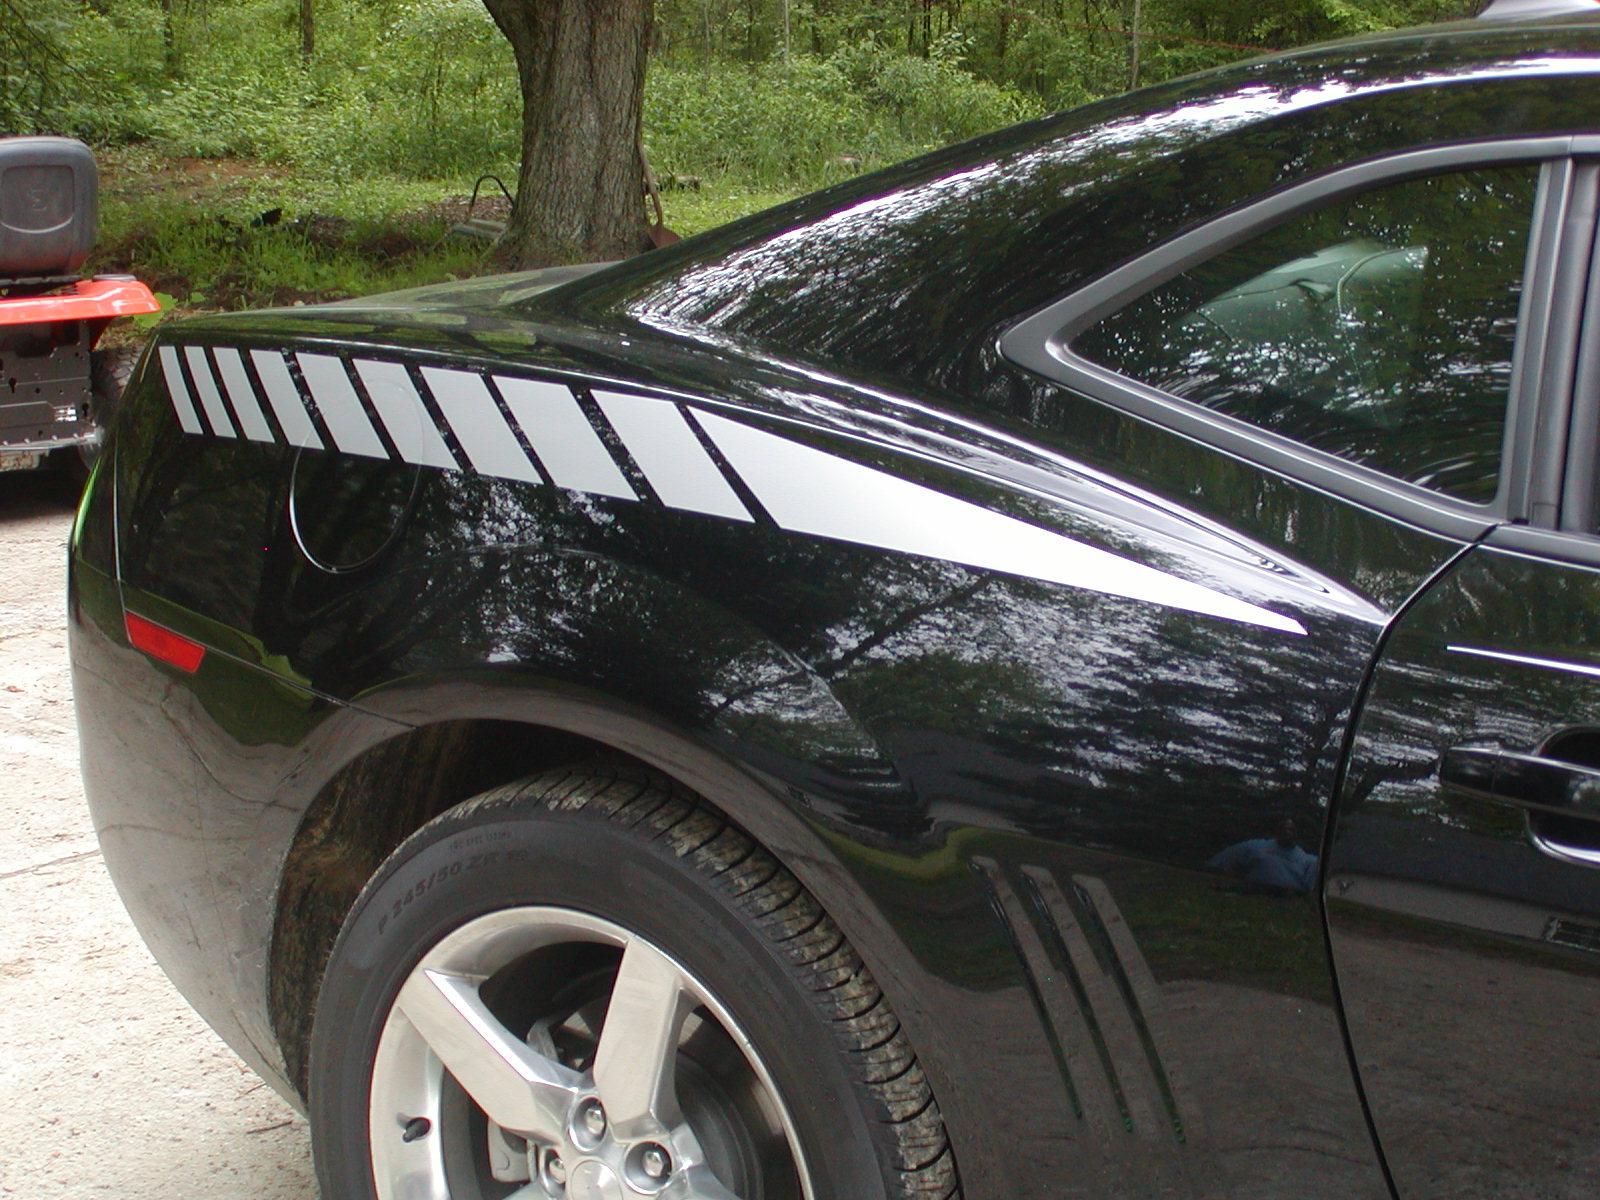 2010 2011 Camaro FADING Rear Quarter Fender Stripe Decals